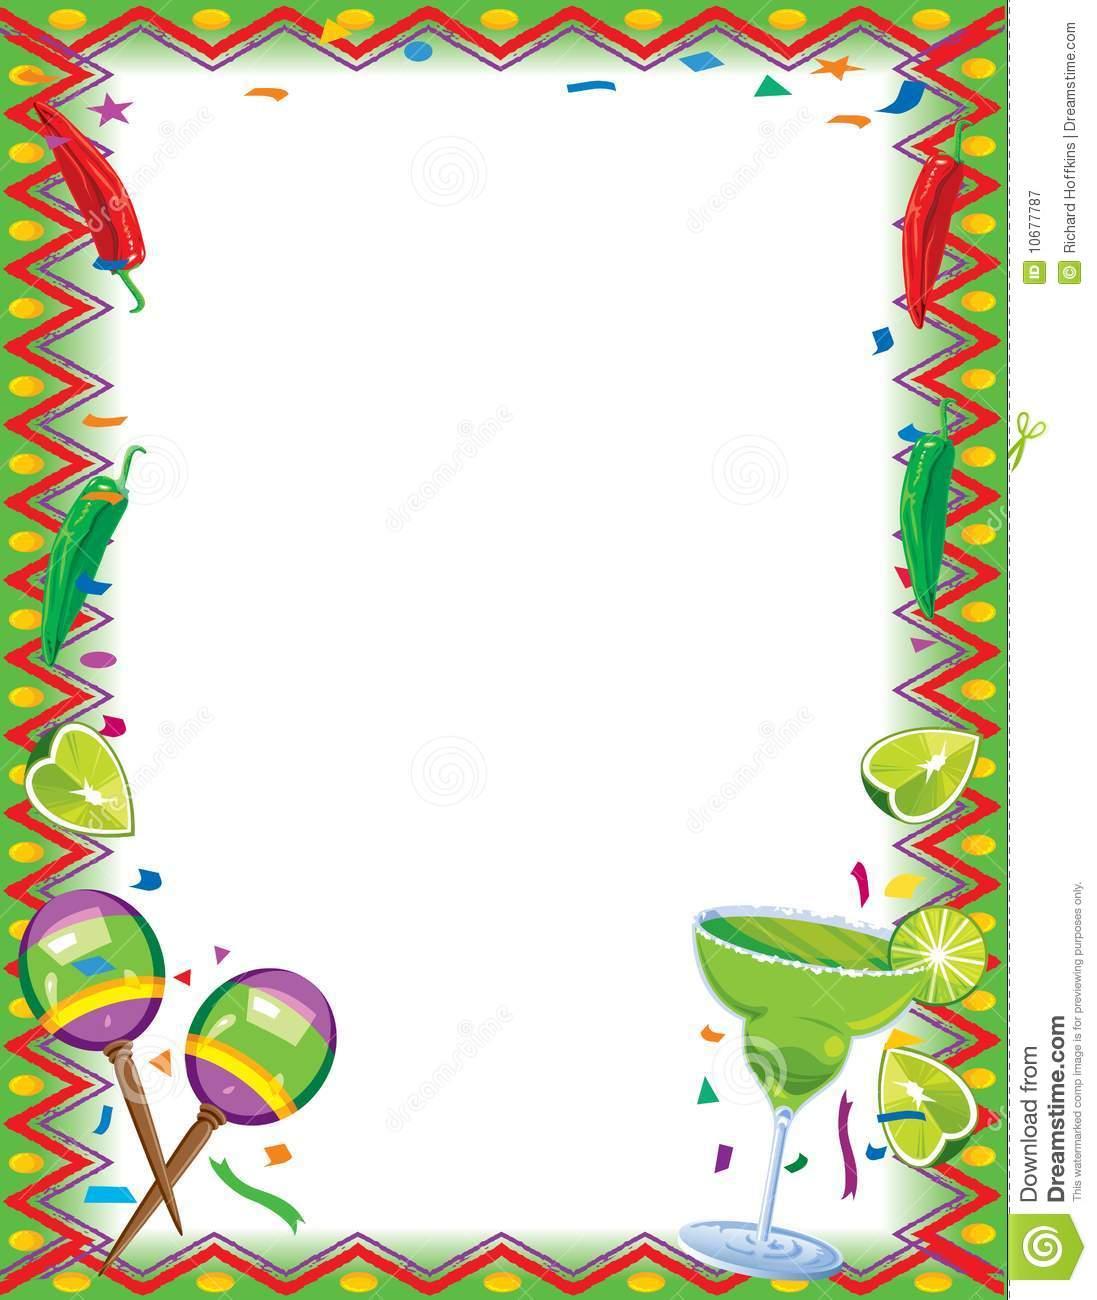 49+] Mexican Fiesta Wallpaper Borders on WallpaperSafari.